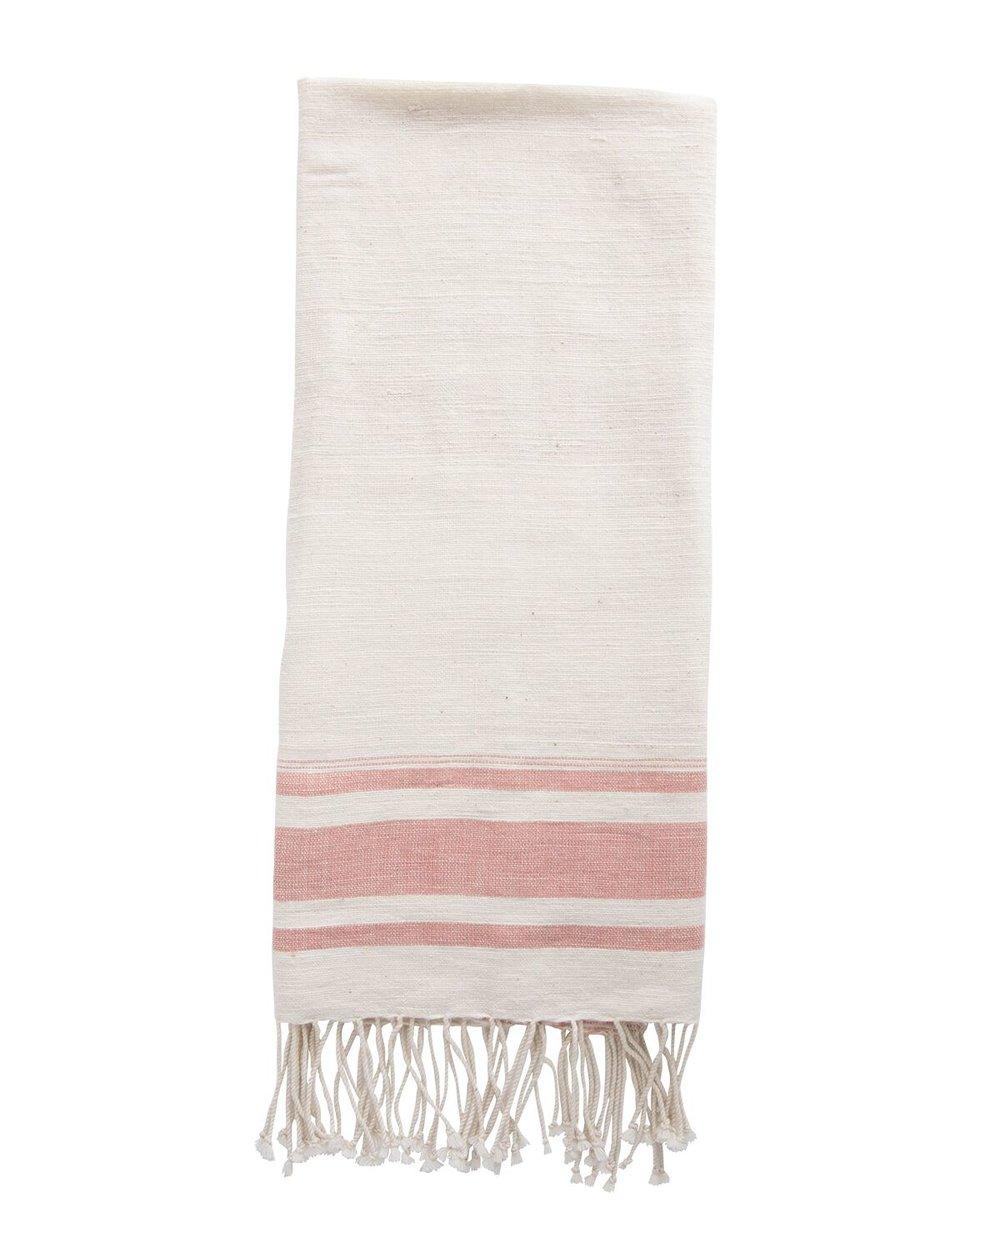 Halifax Stripe Hand Towel 1_preview.jpg